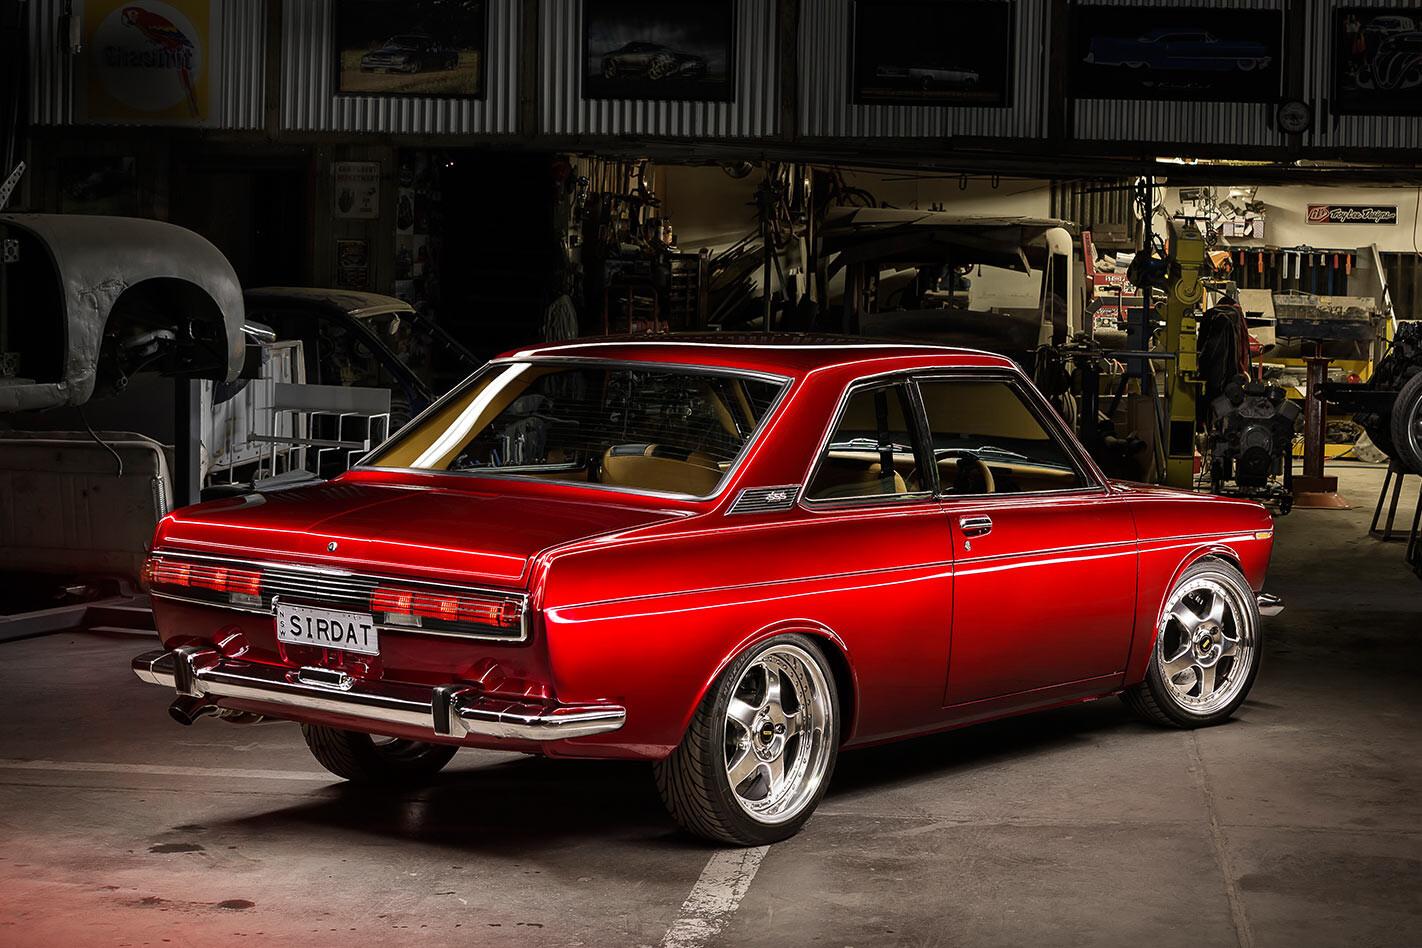 Datsun 1600 rear